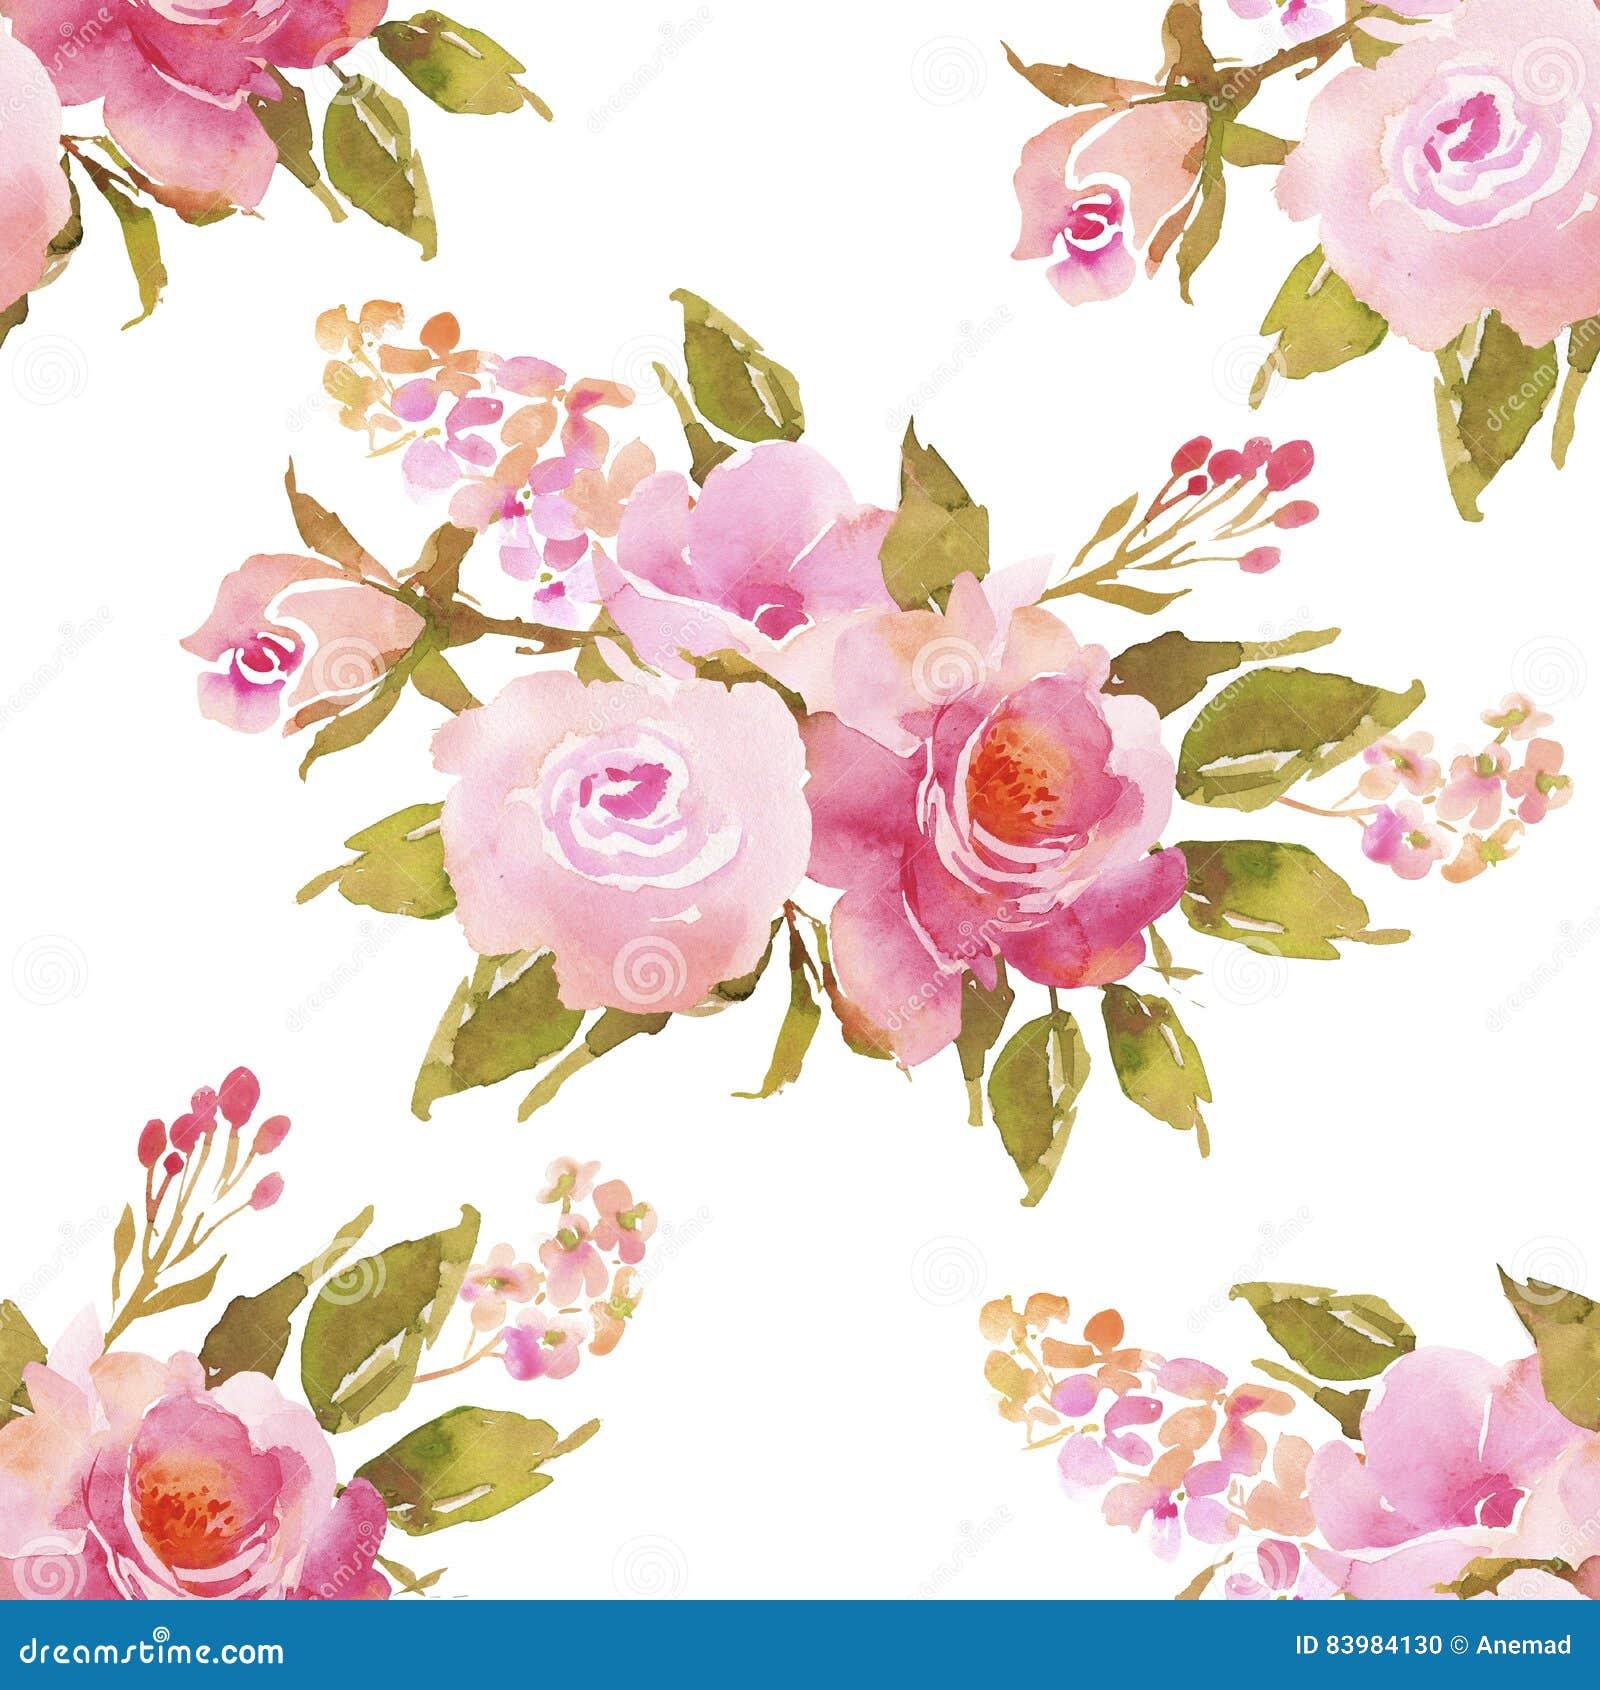 Dark Red Roses Flowers Watercolor Botanical Art Boho: Abstract Pink Roses Flower Watercolor Seamless Pattern